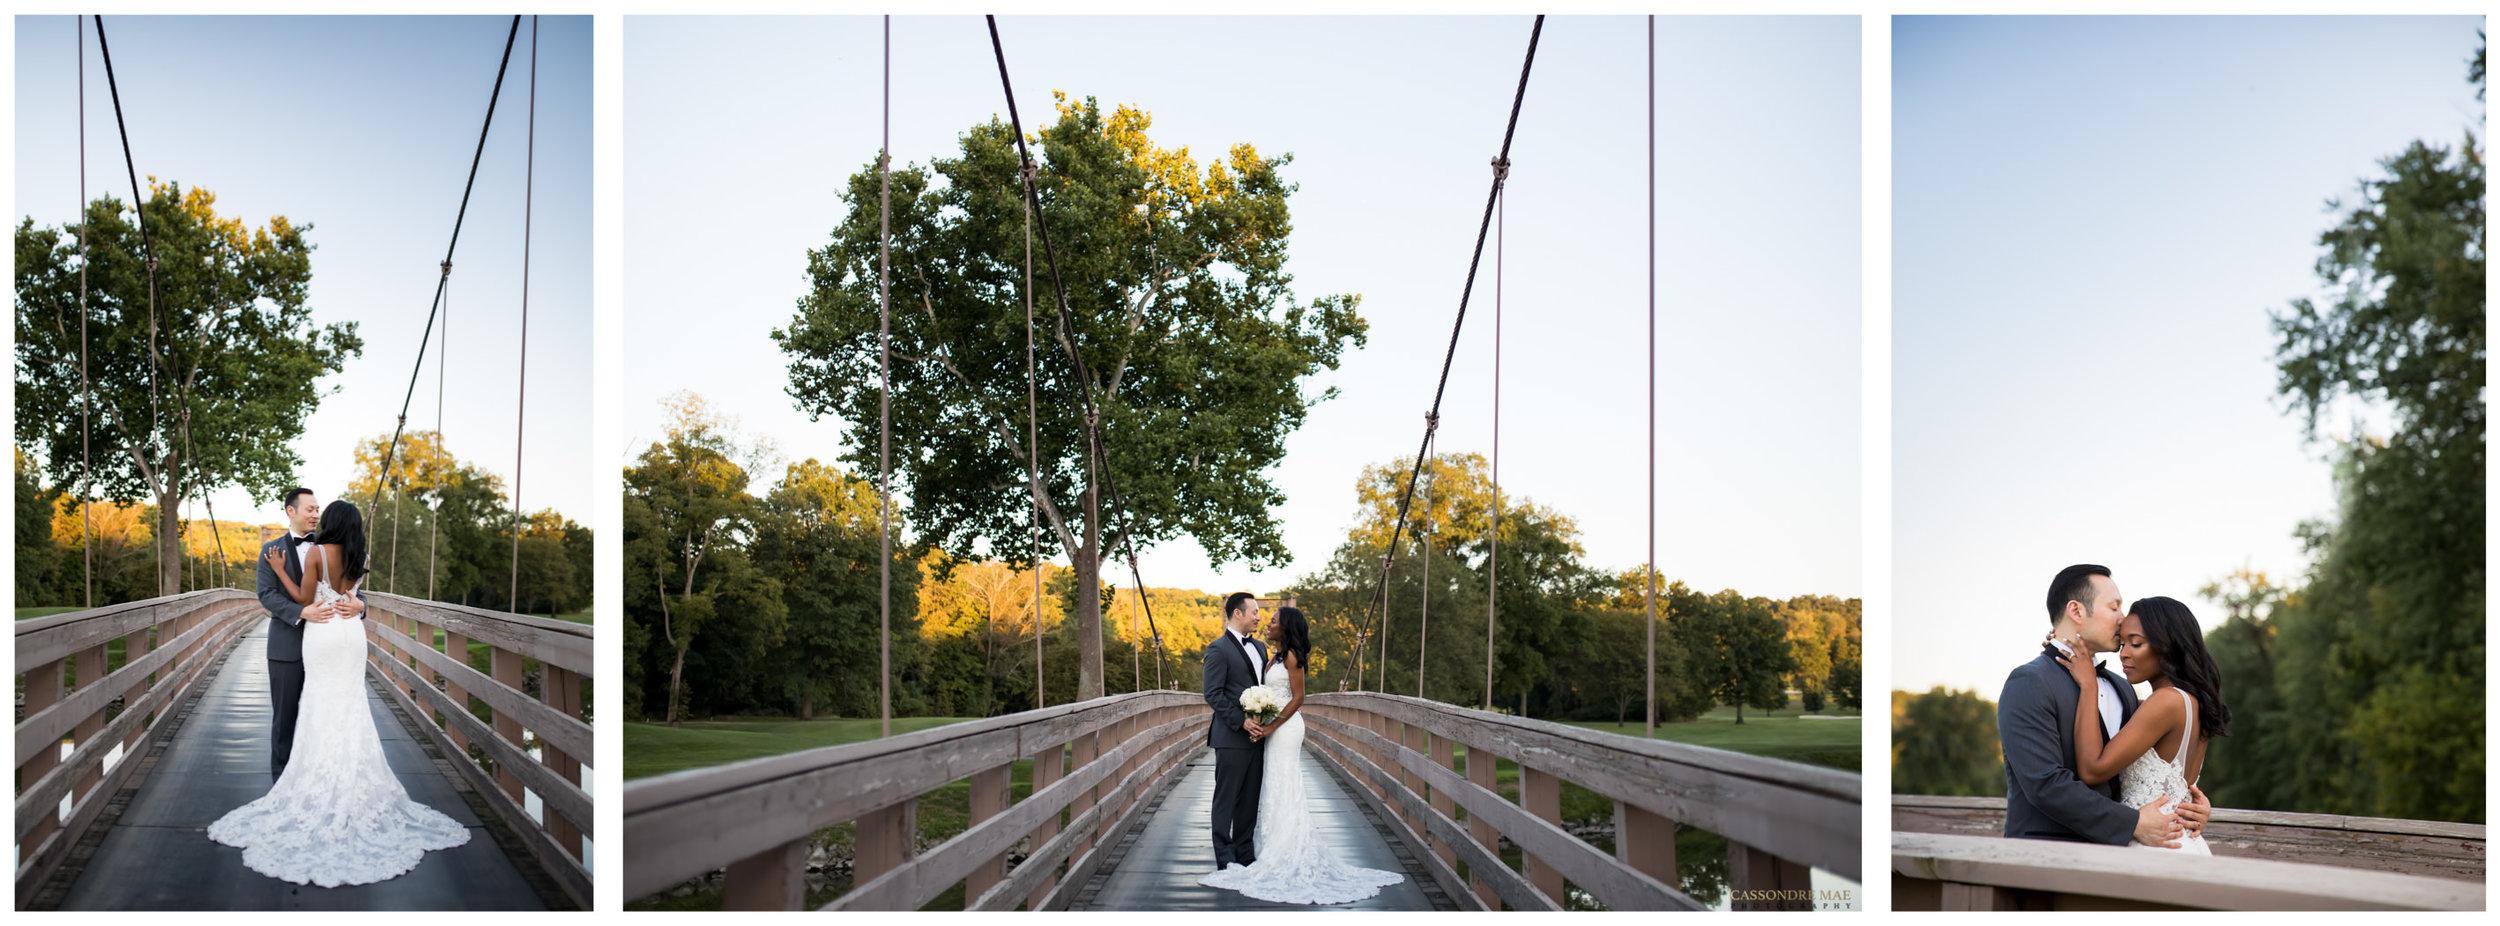 West Hills Country Club Wedding Photos Cassondre Mae Photography 14.jpg